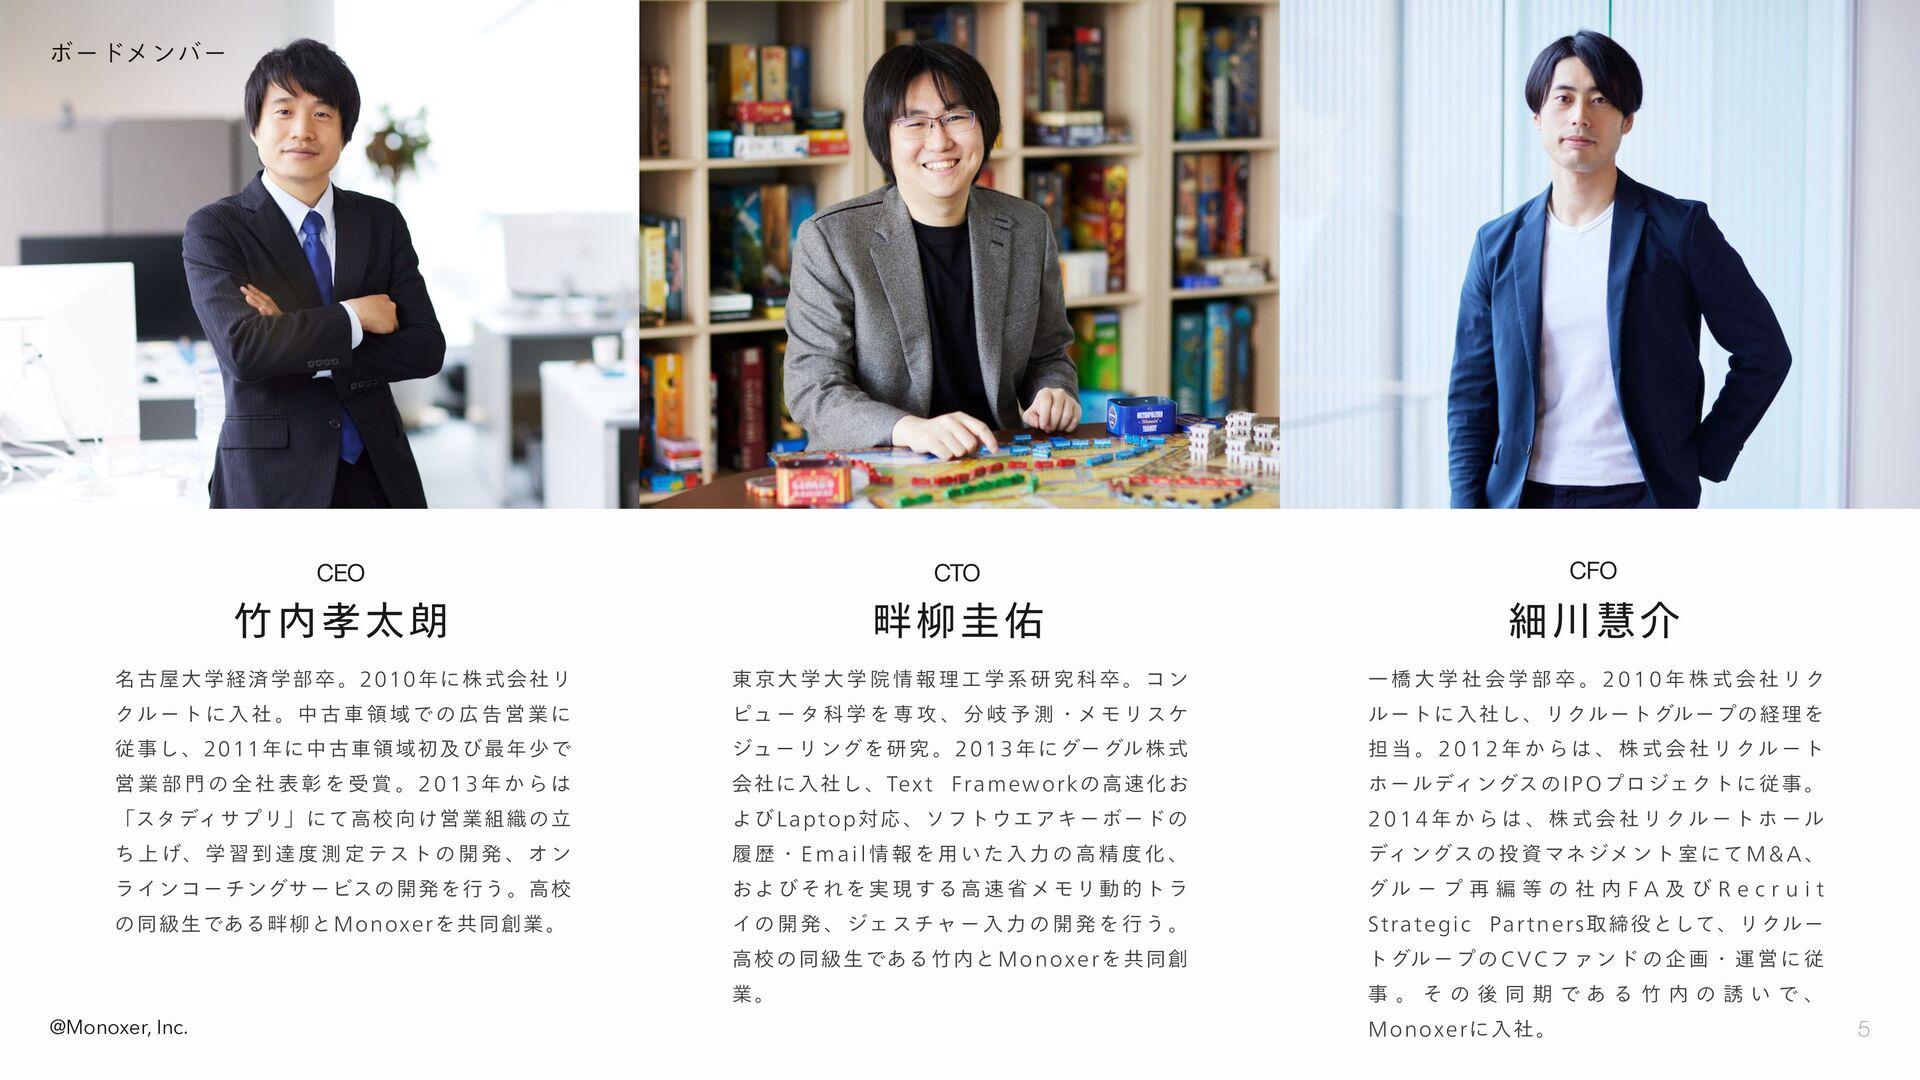 5 @Monoxer, Inc. ボードメンバー 竹内孝太朗 CEO 畔柳圭佑 CTO 細川慧...